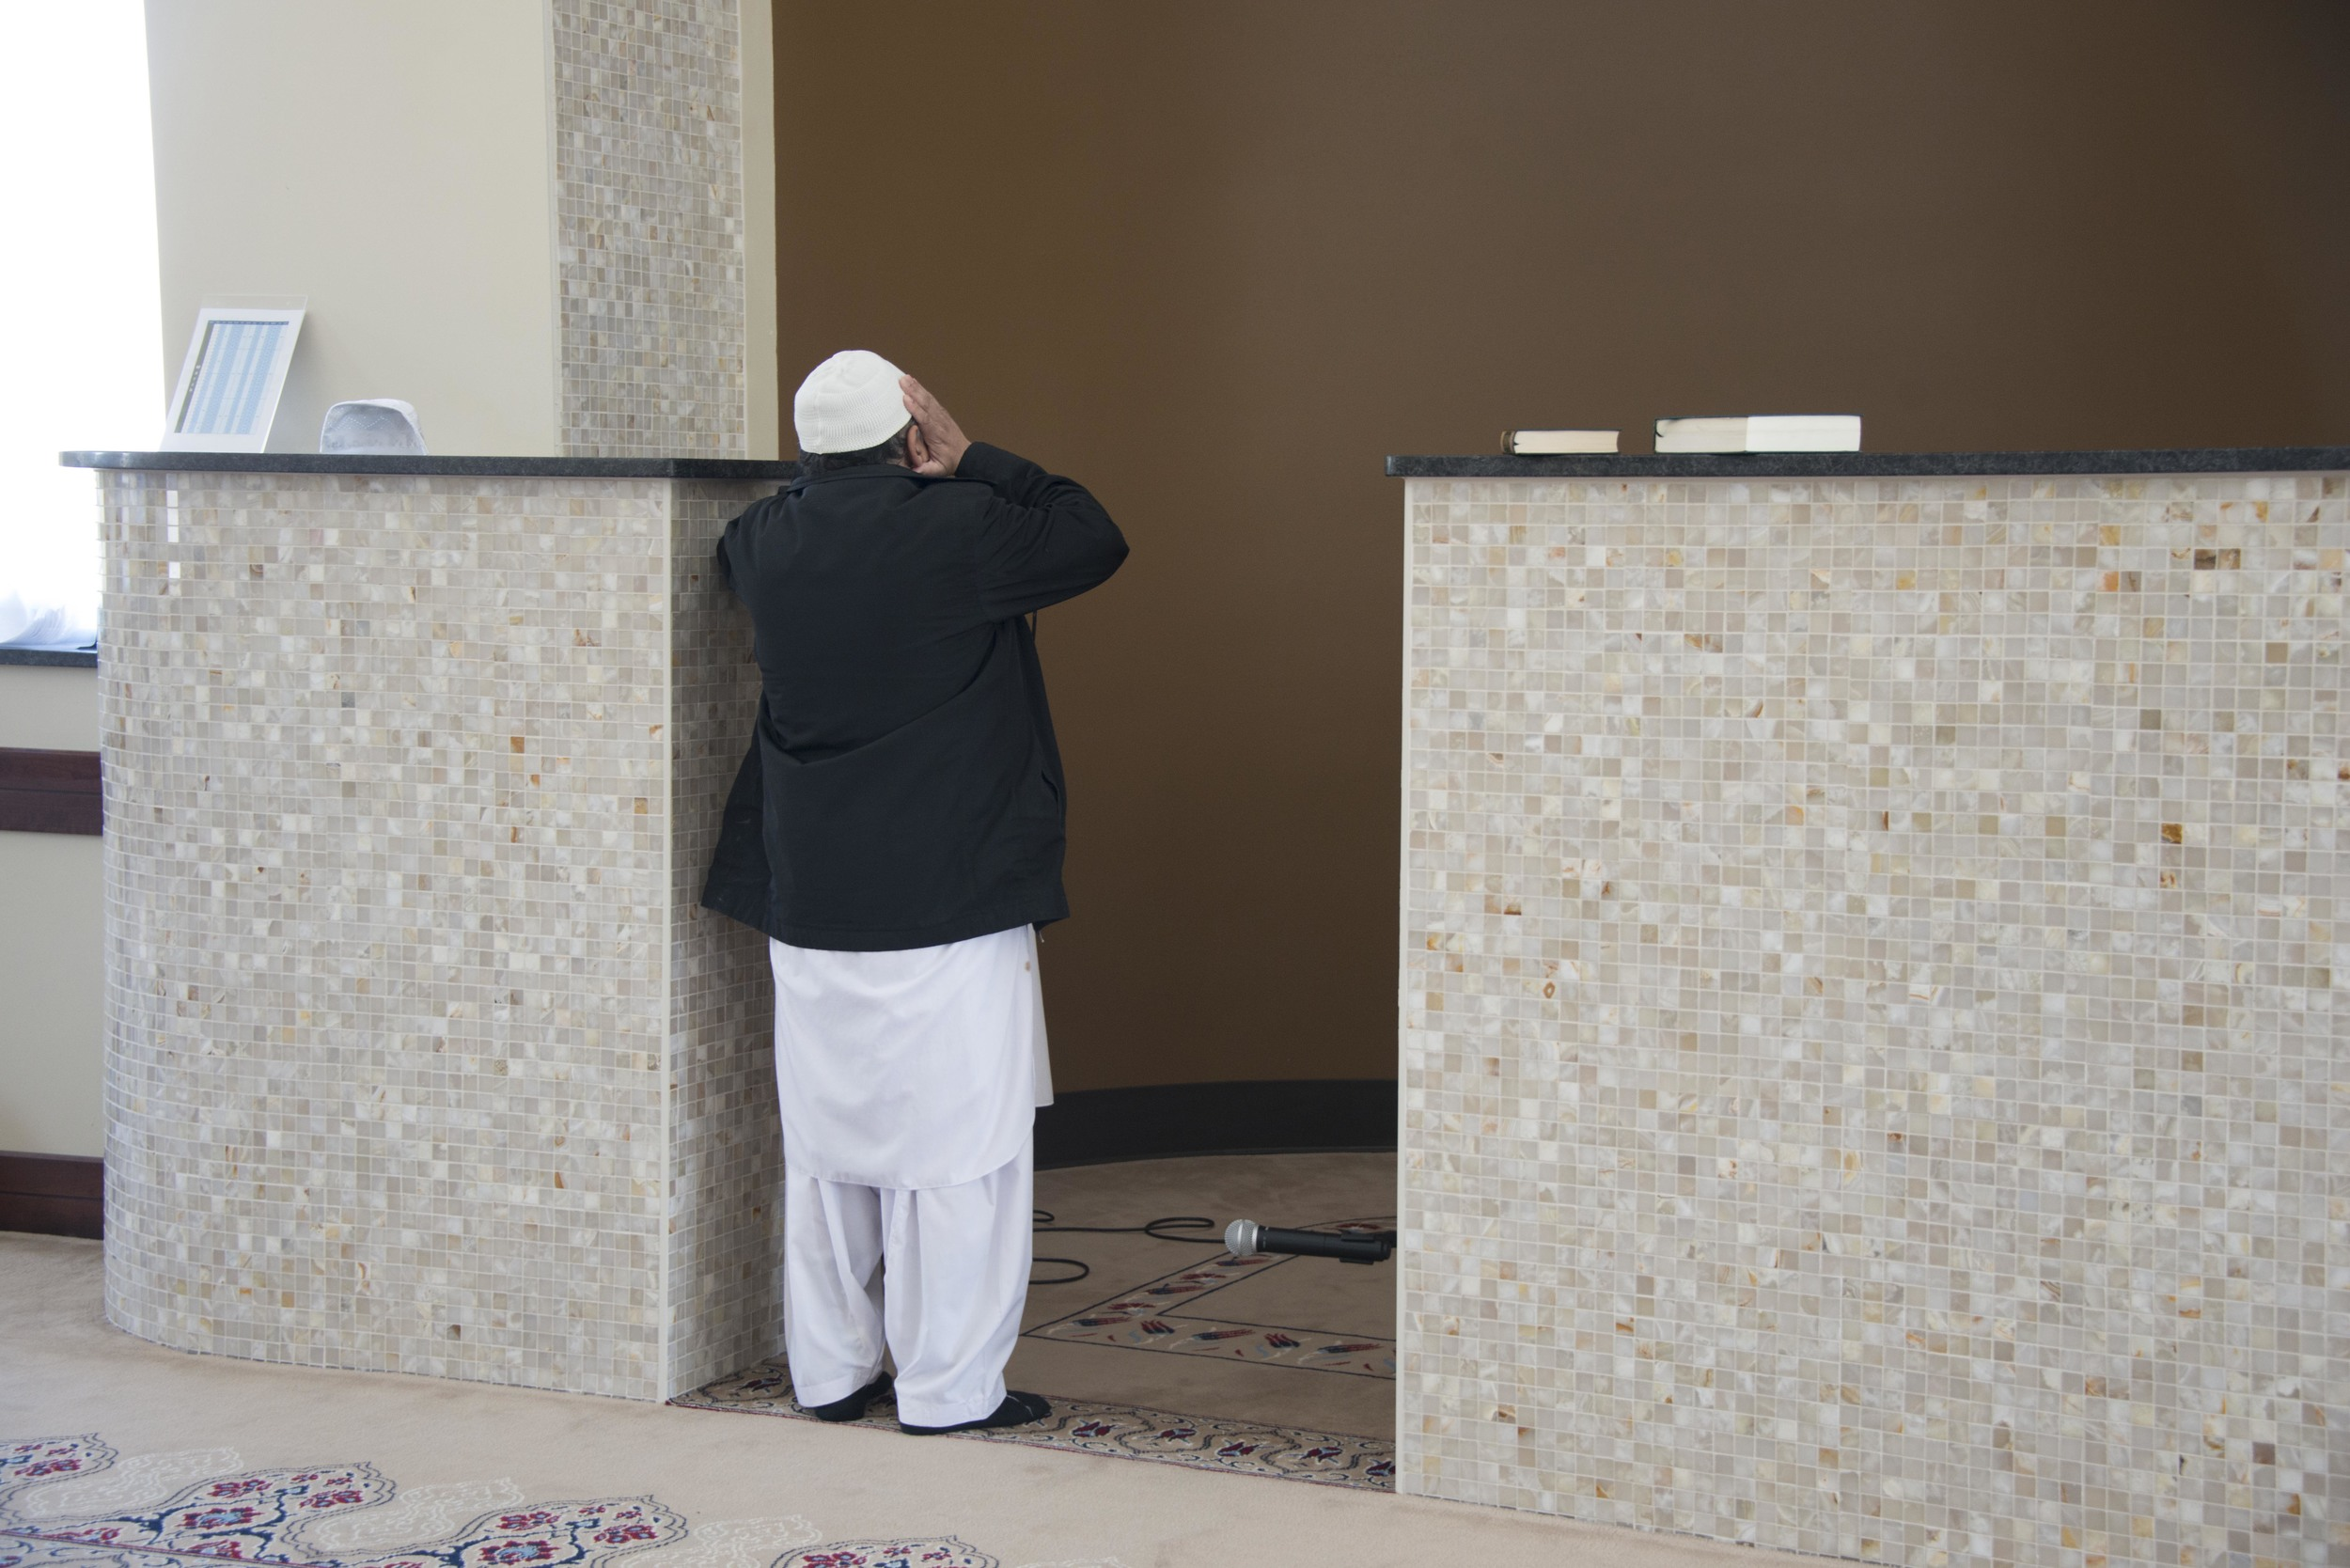 Azaan: Call for prayer